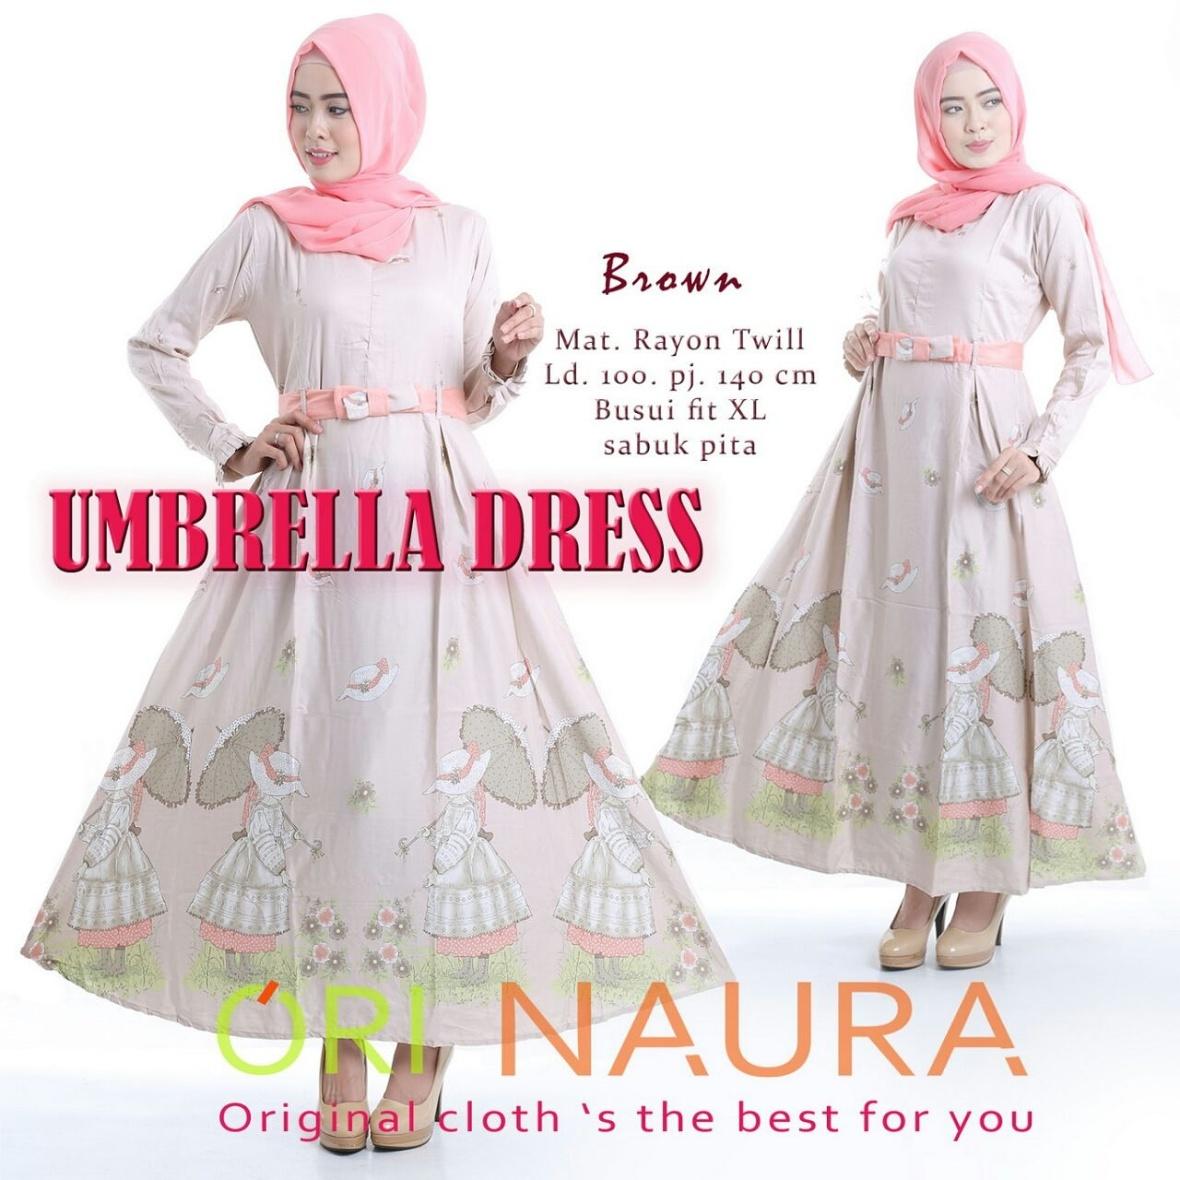 umbrella-dress-brown